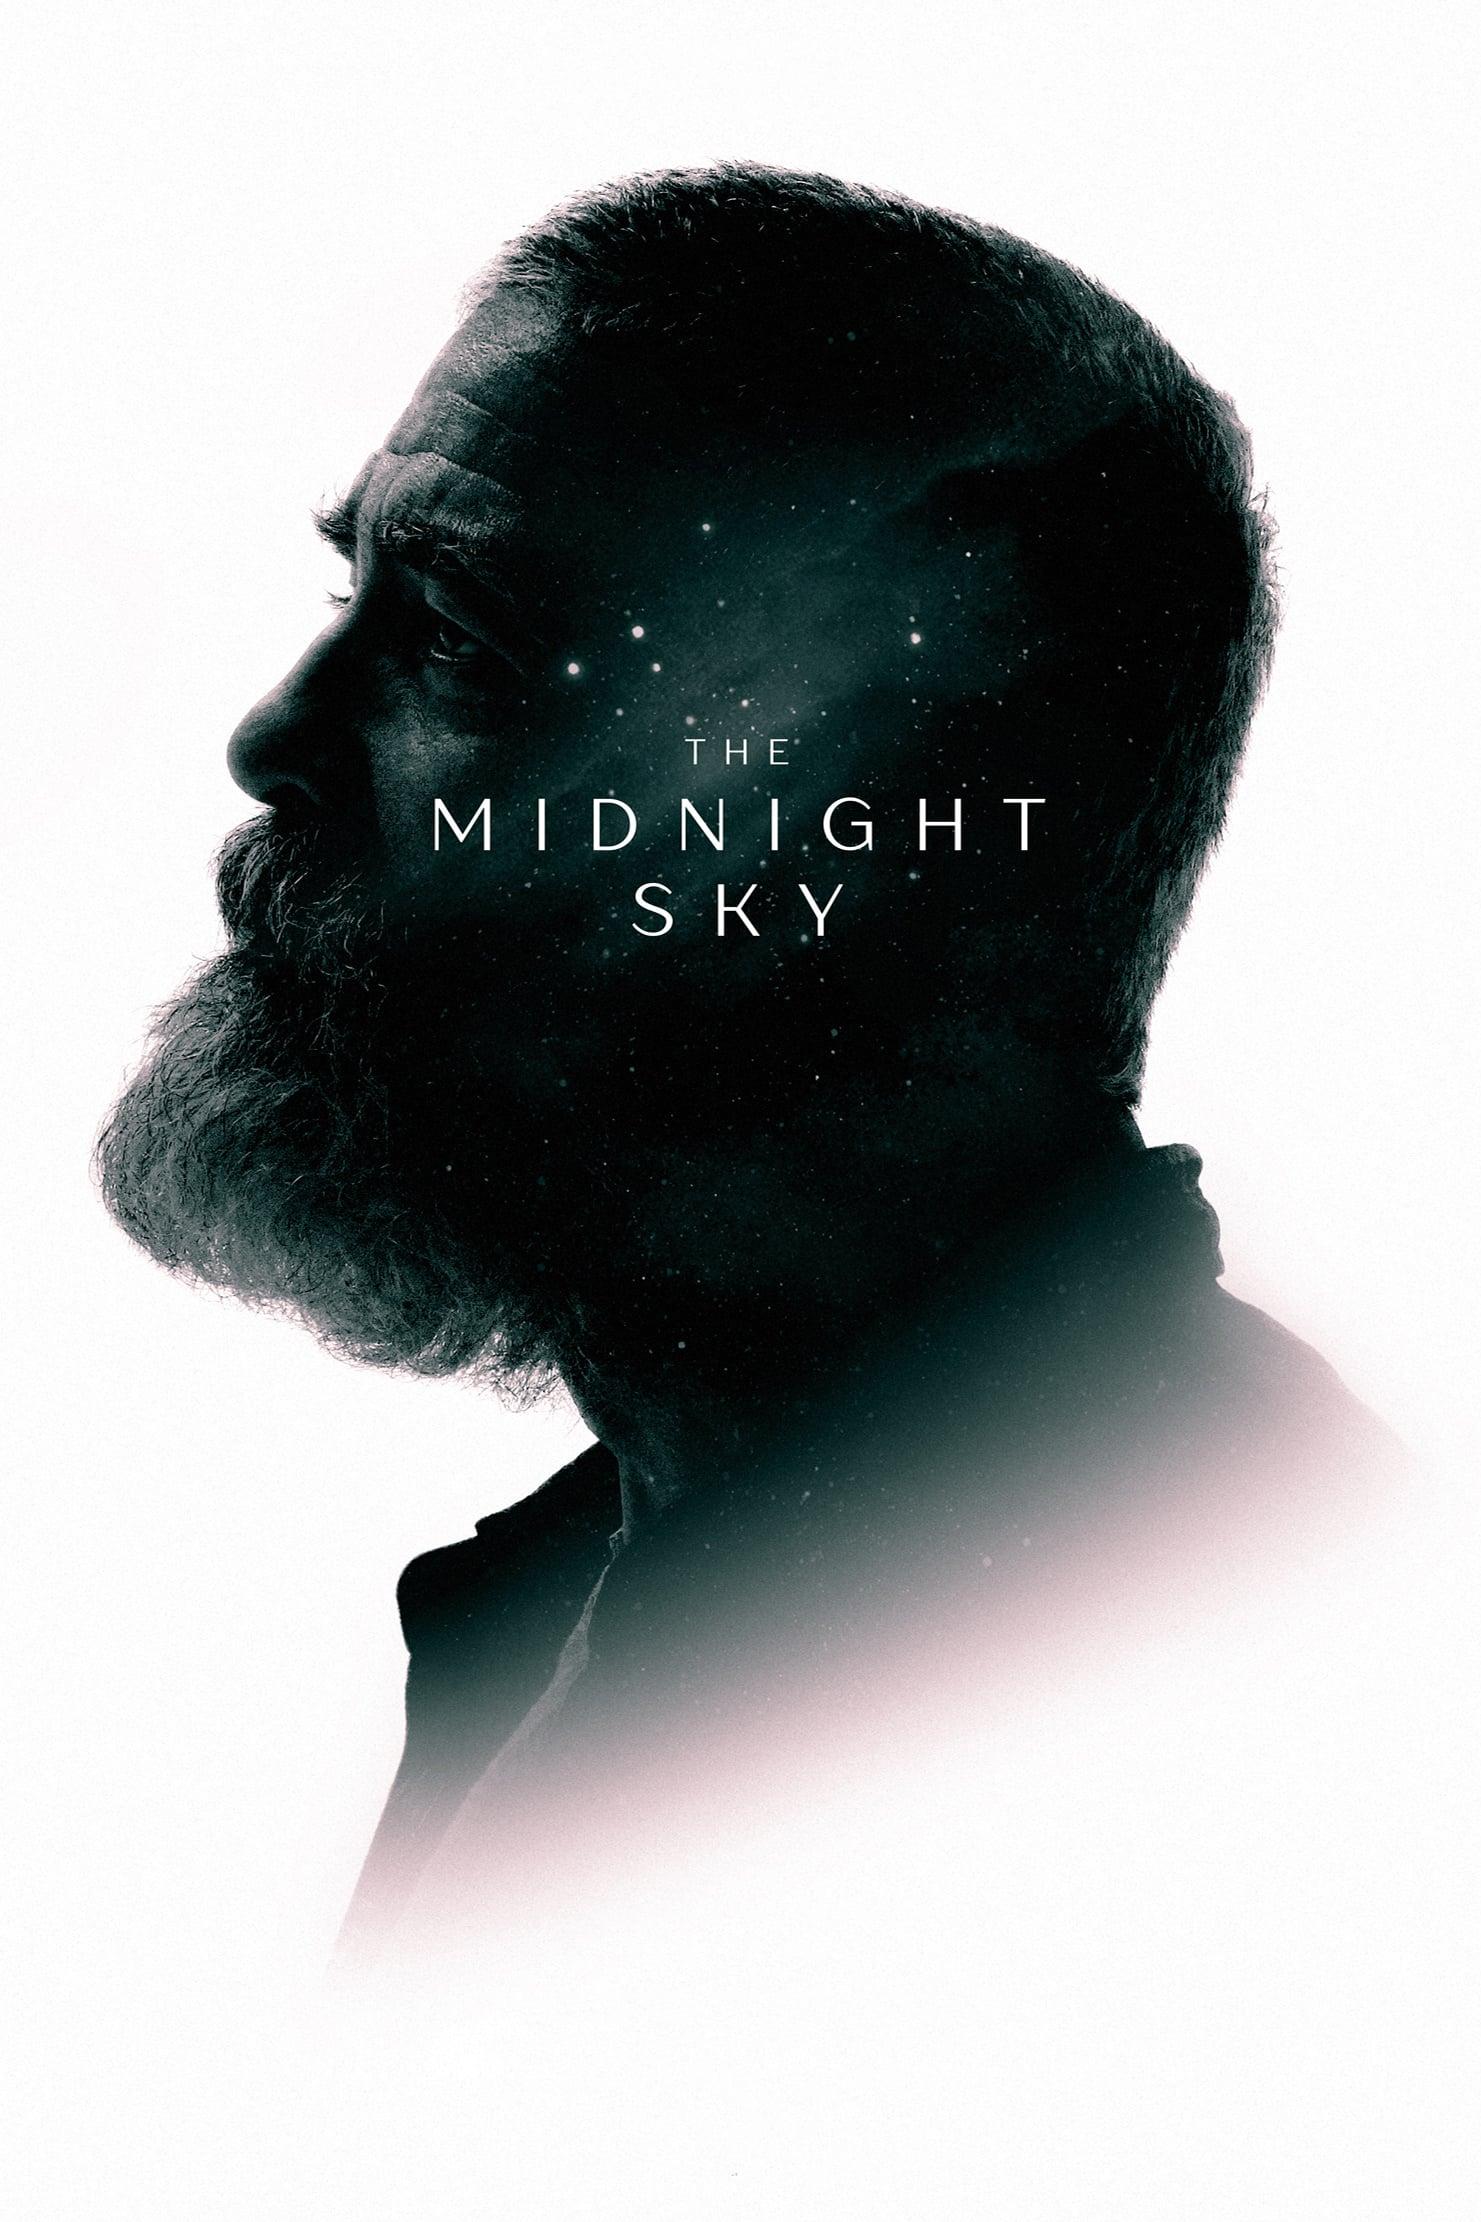 The Midnight Sky - CINEMABLEND